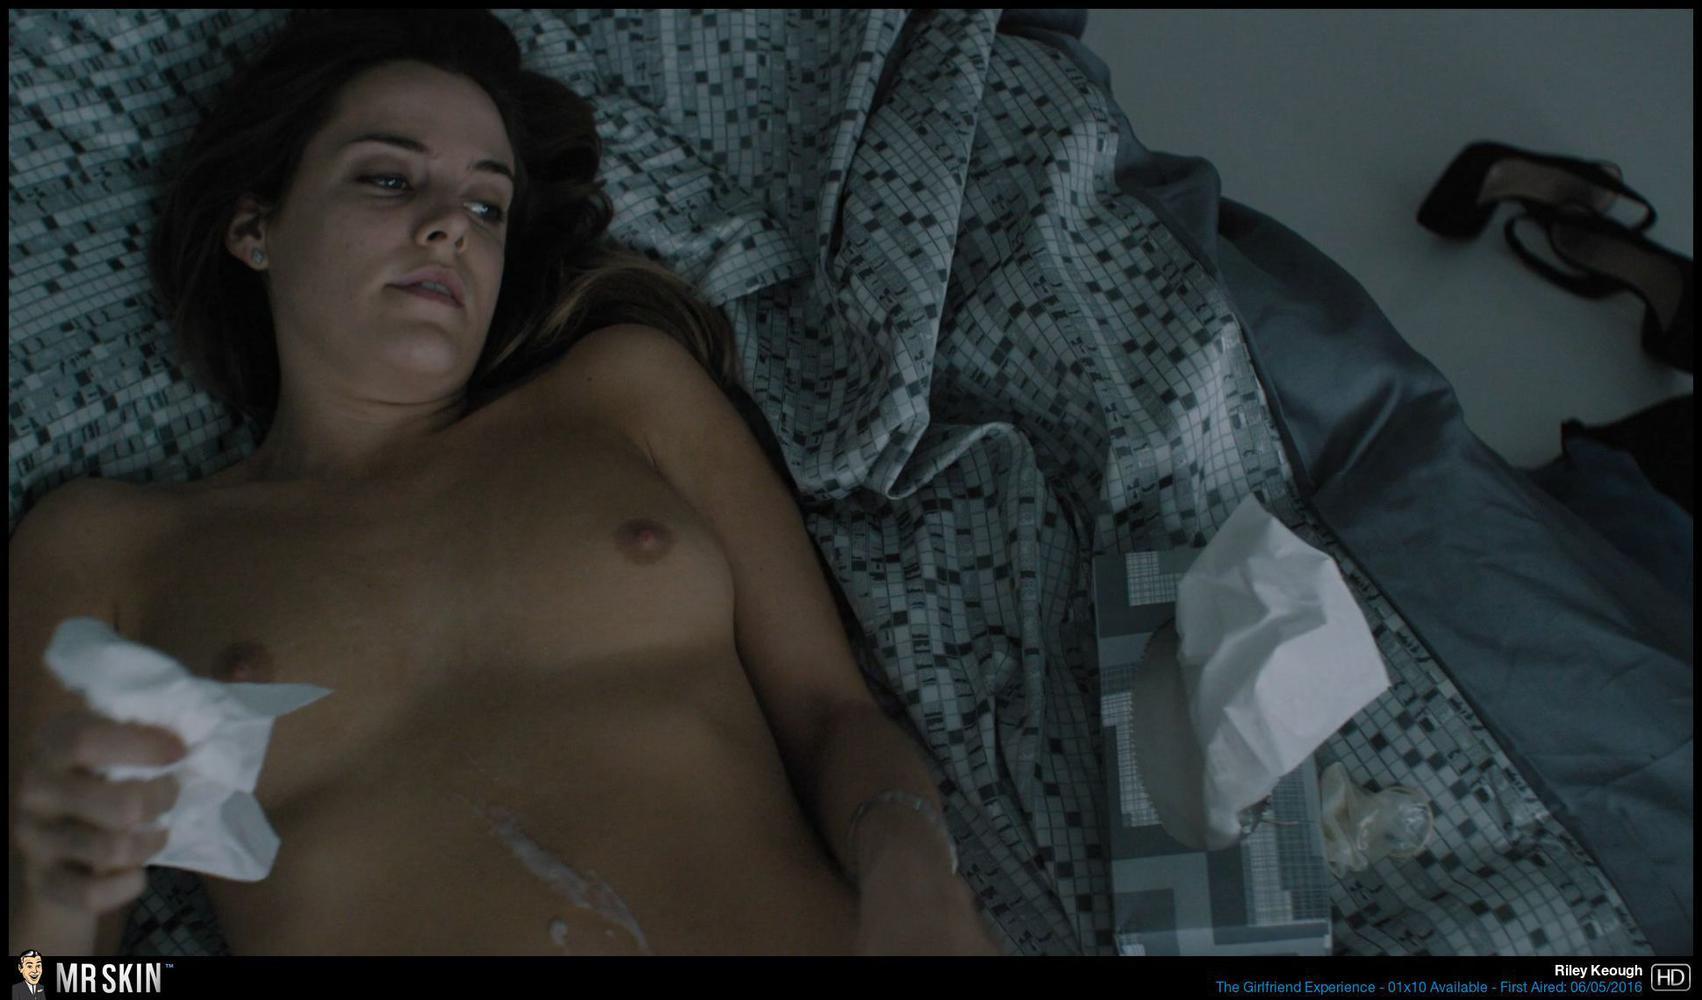 Nude teen erotic art